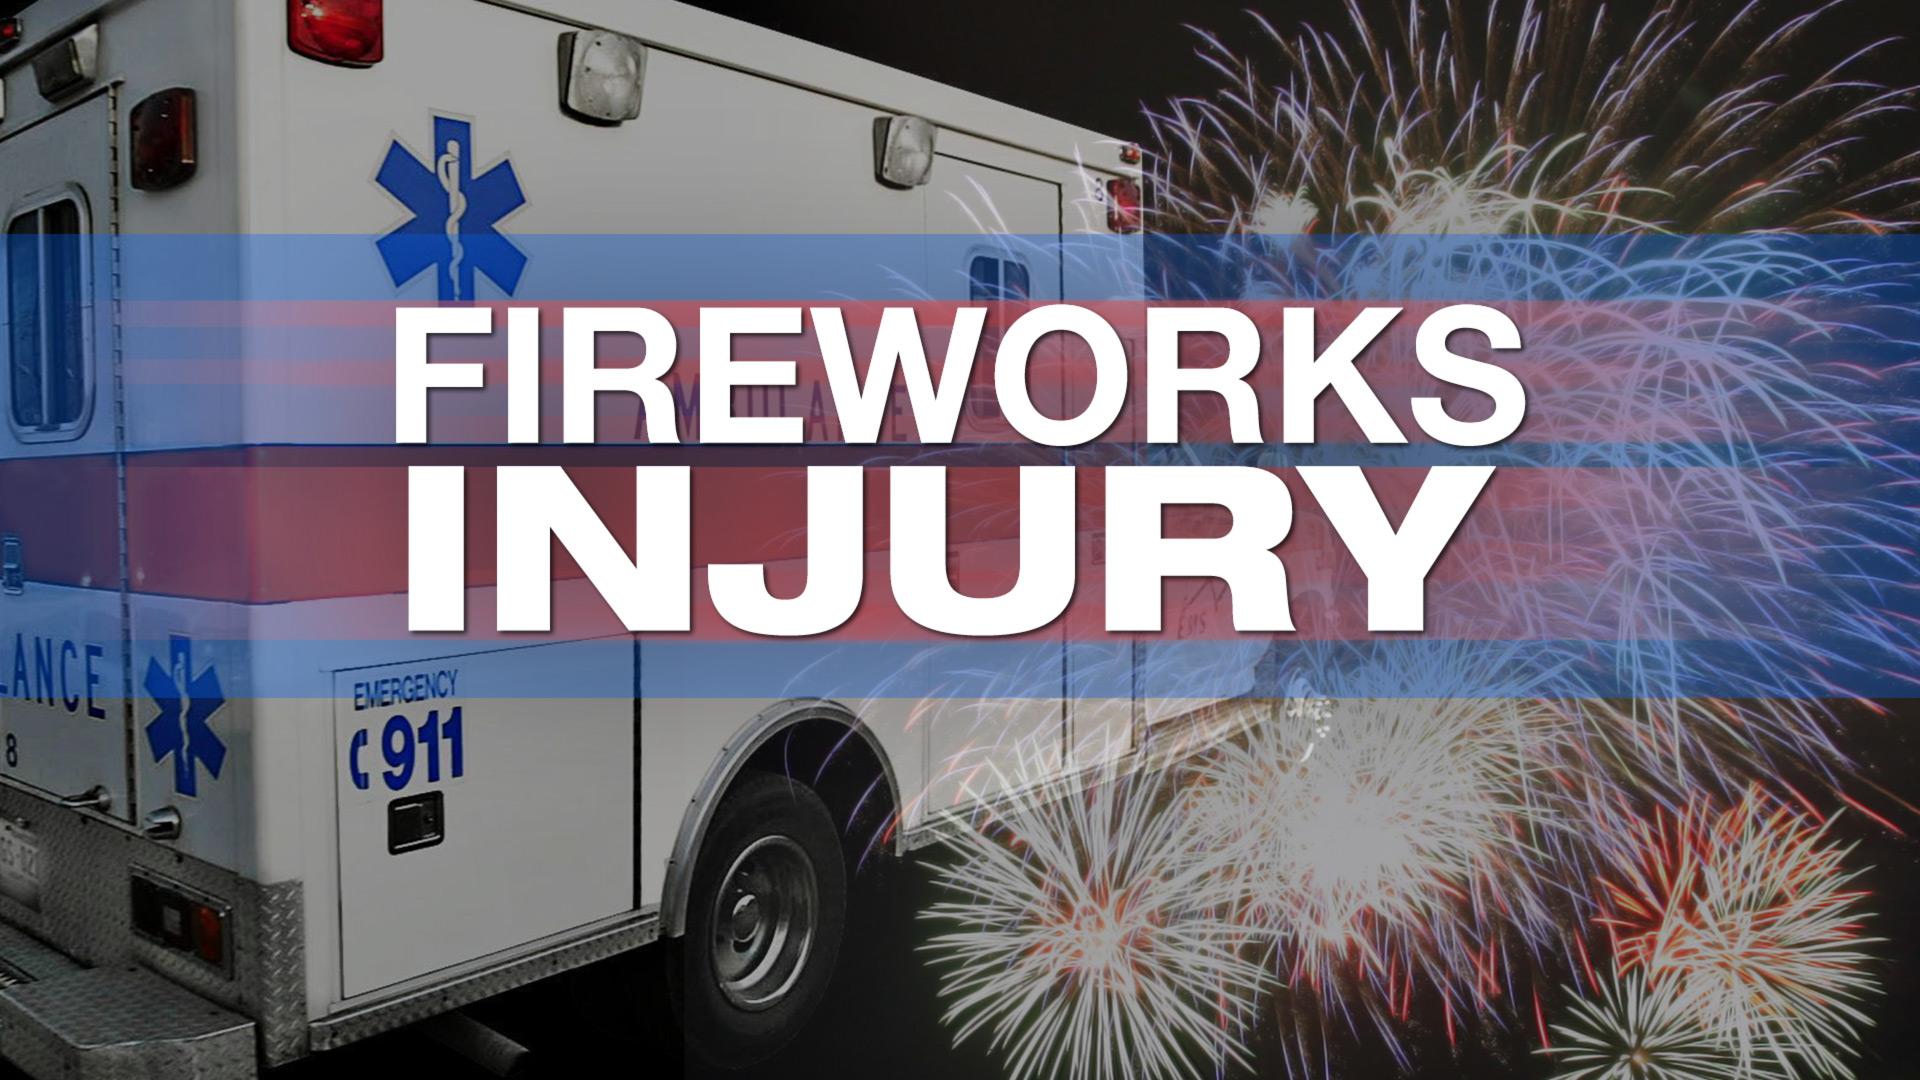 Fireworks-Injury_35899